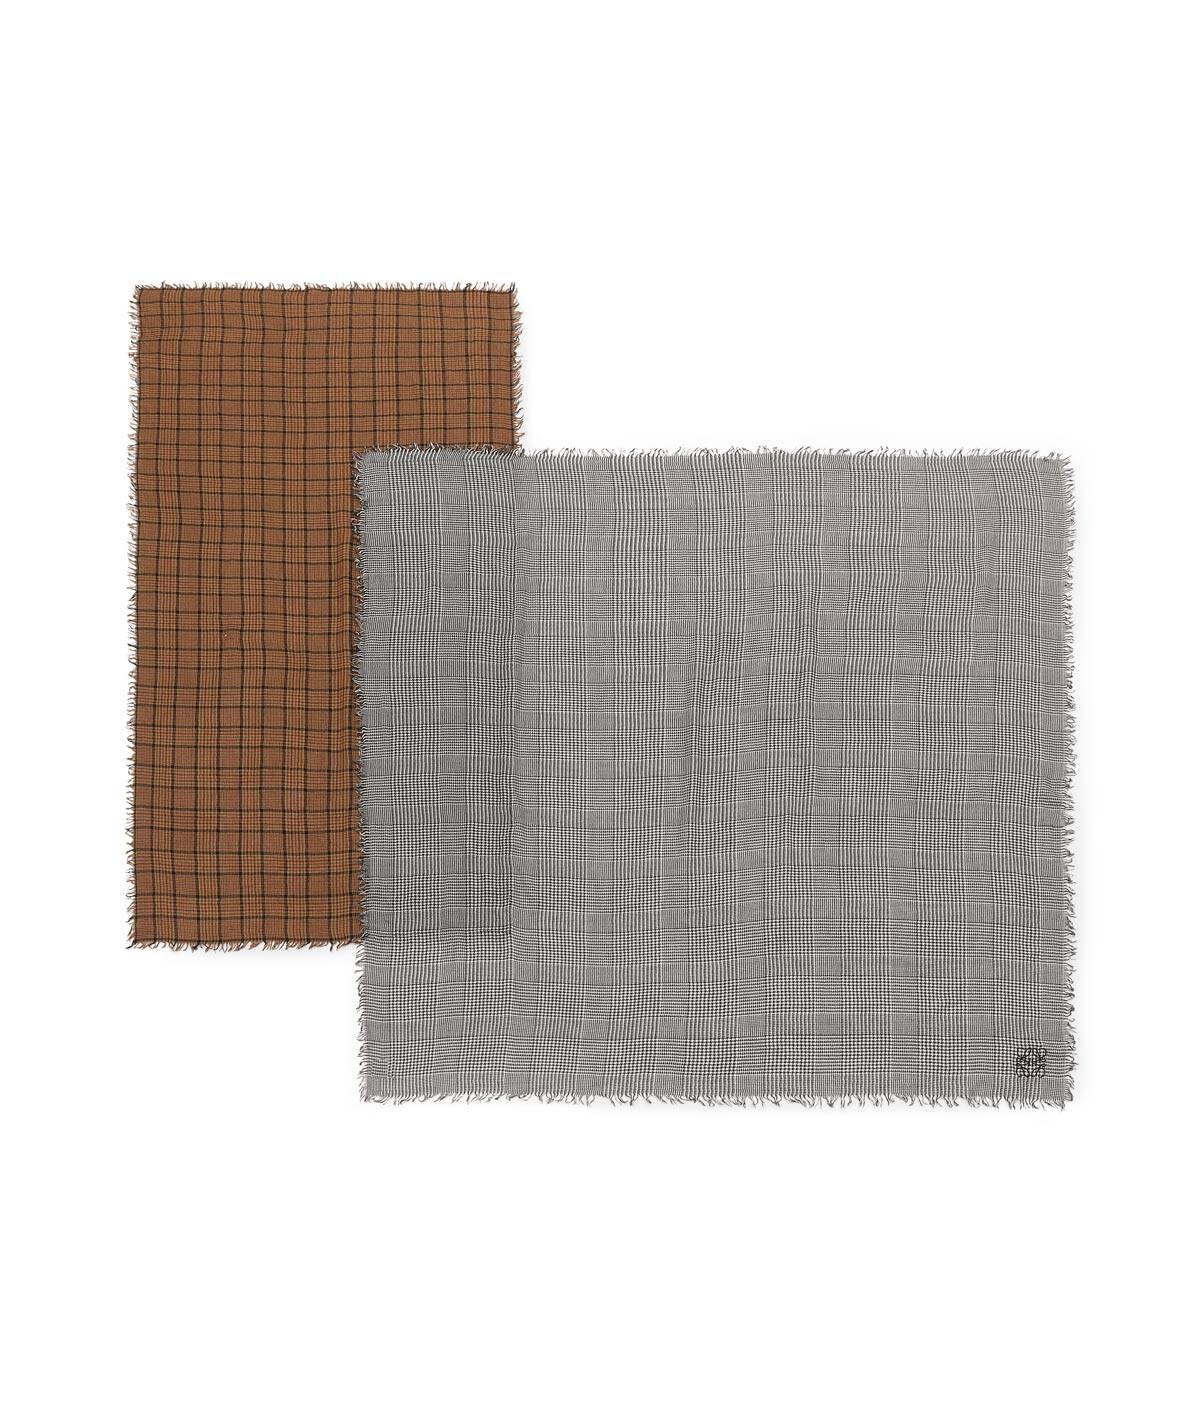 LOEWE 180X220 ダブル スカーフ パッチワーク Toffee/Grey front